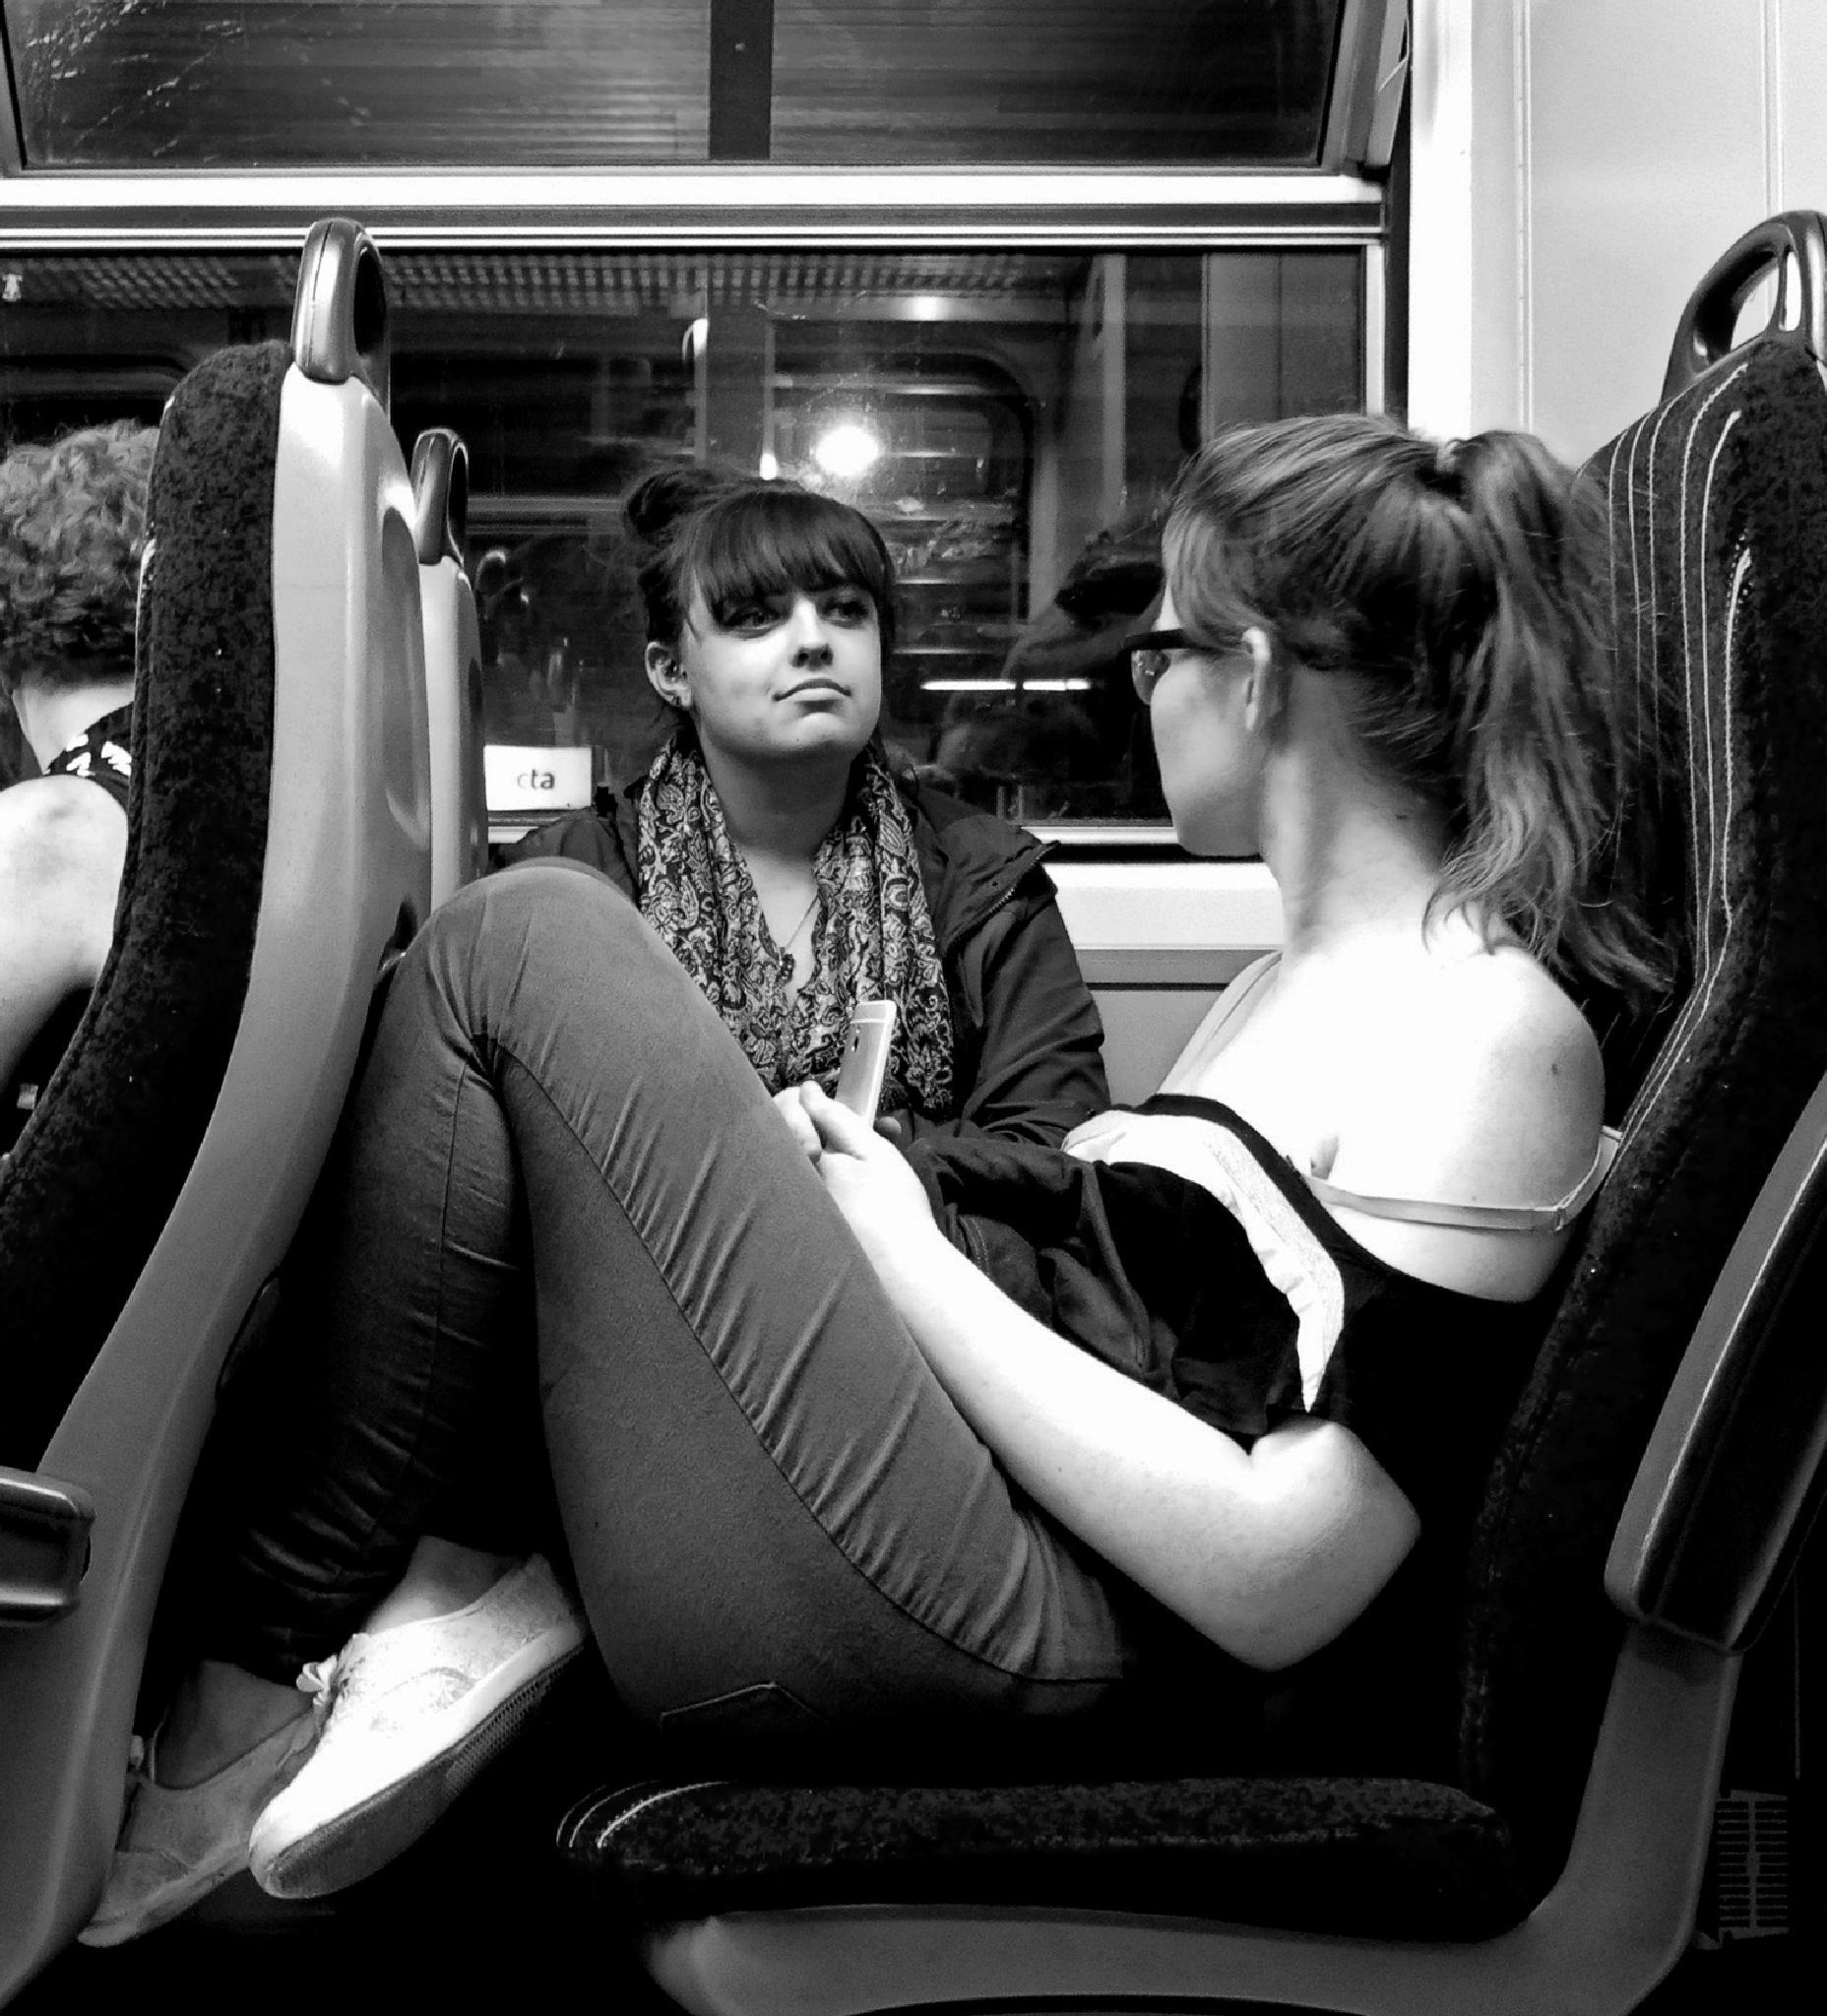 Girls on a train by Dead Batteries